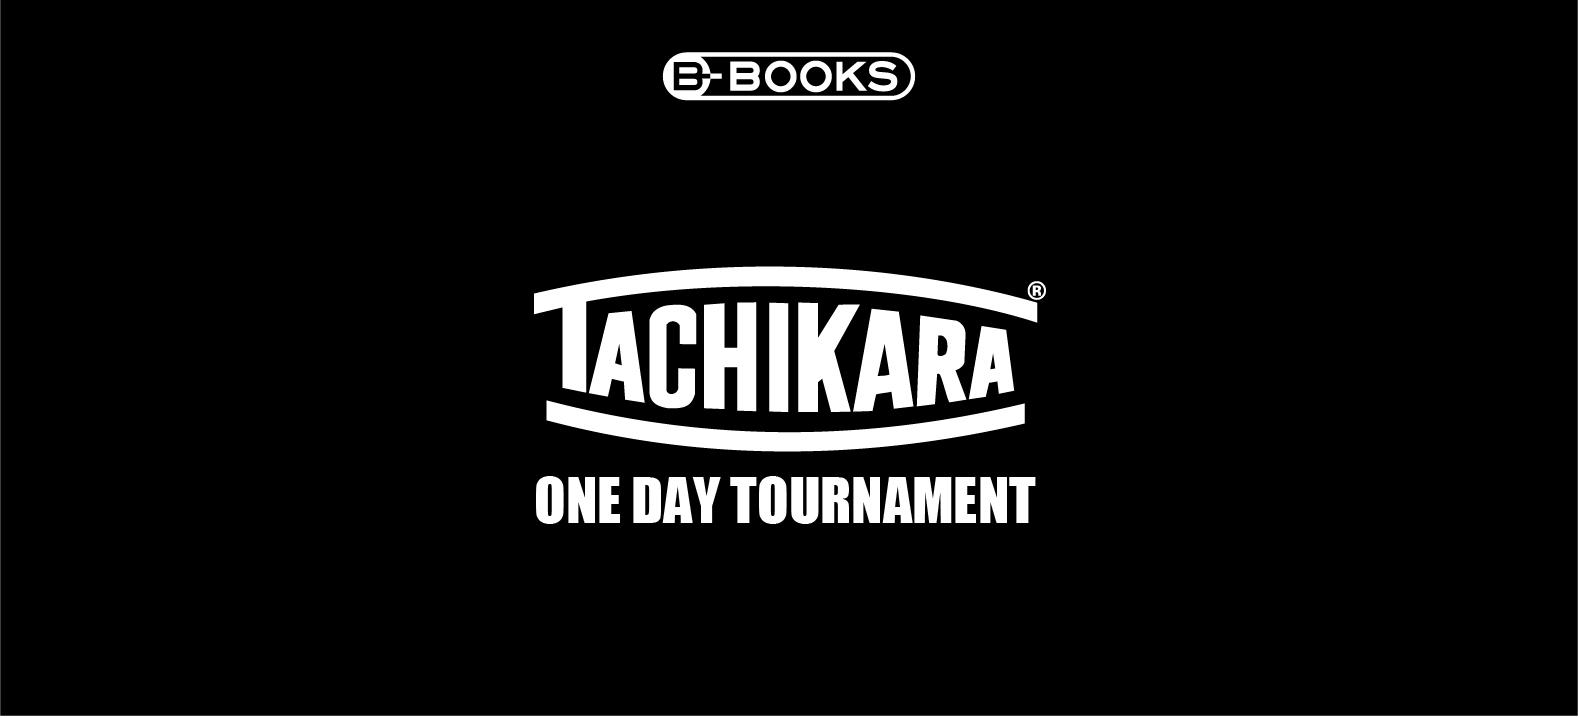 TACHIKARA 1DAY TOURNAMENT